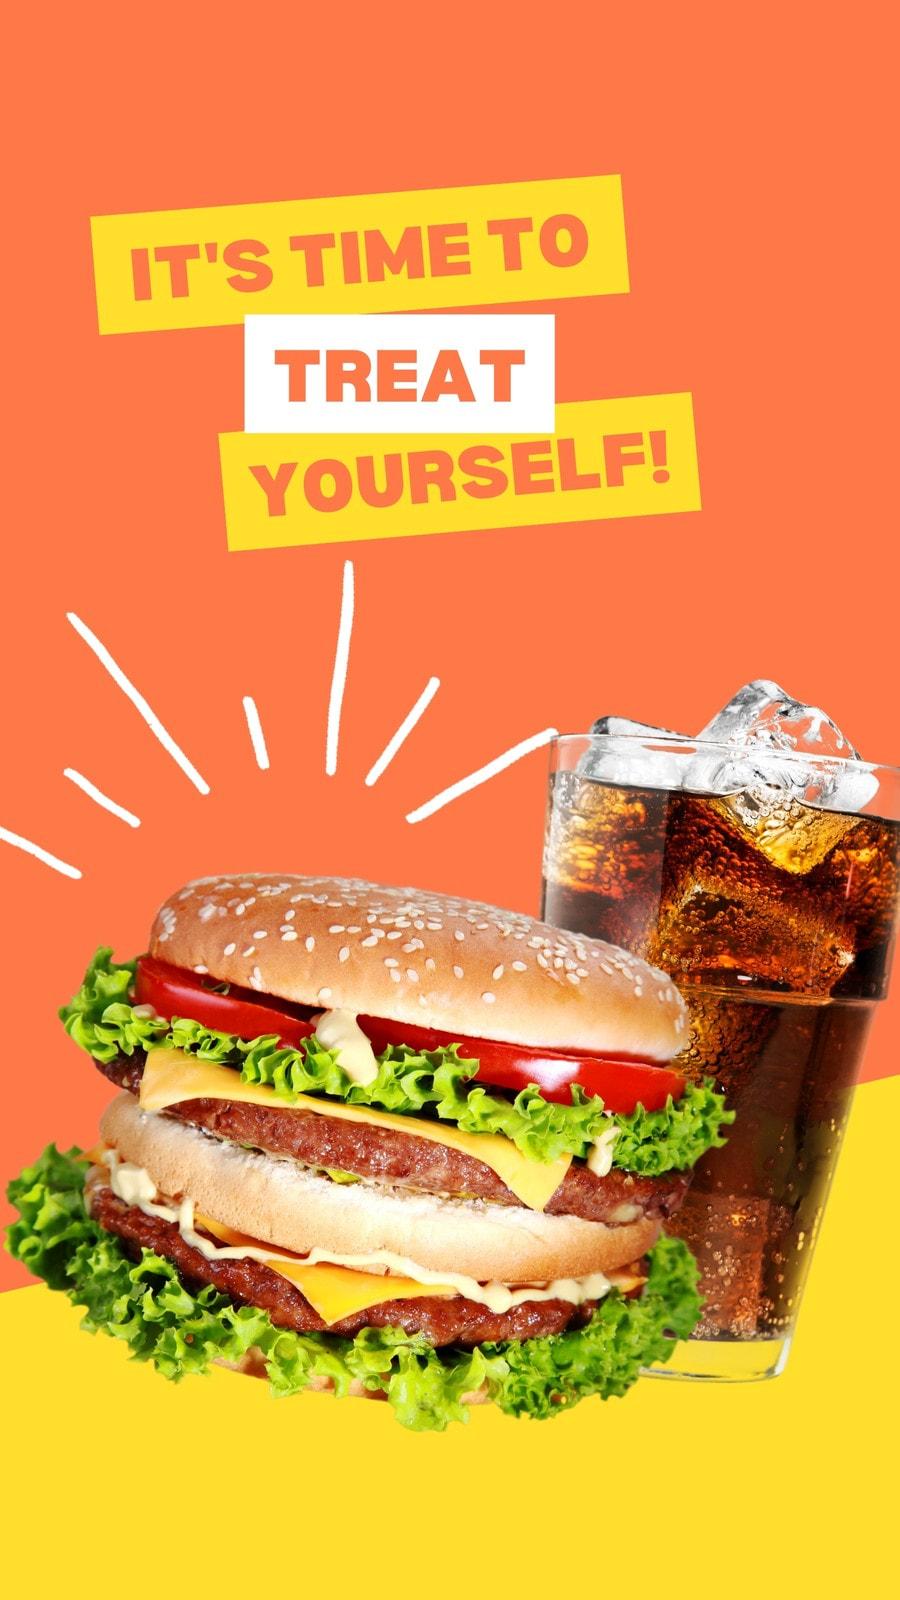 Orange and Yellow Burger Typographic Food TikTok Video Ad